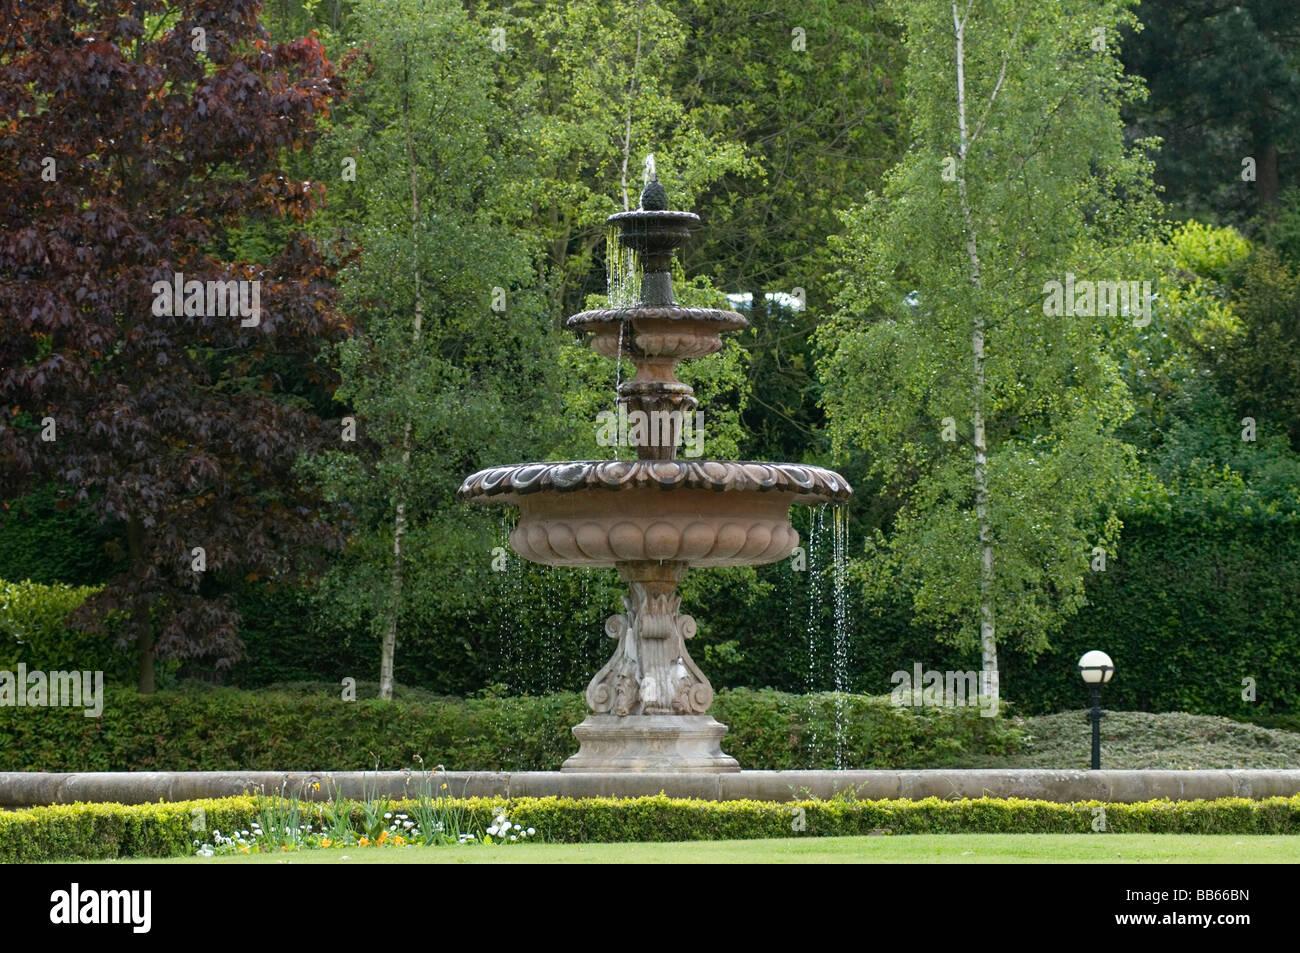 springbrunnen brunnen garten garten wasser stockfoto, bild: 24108329